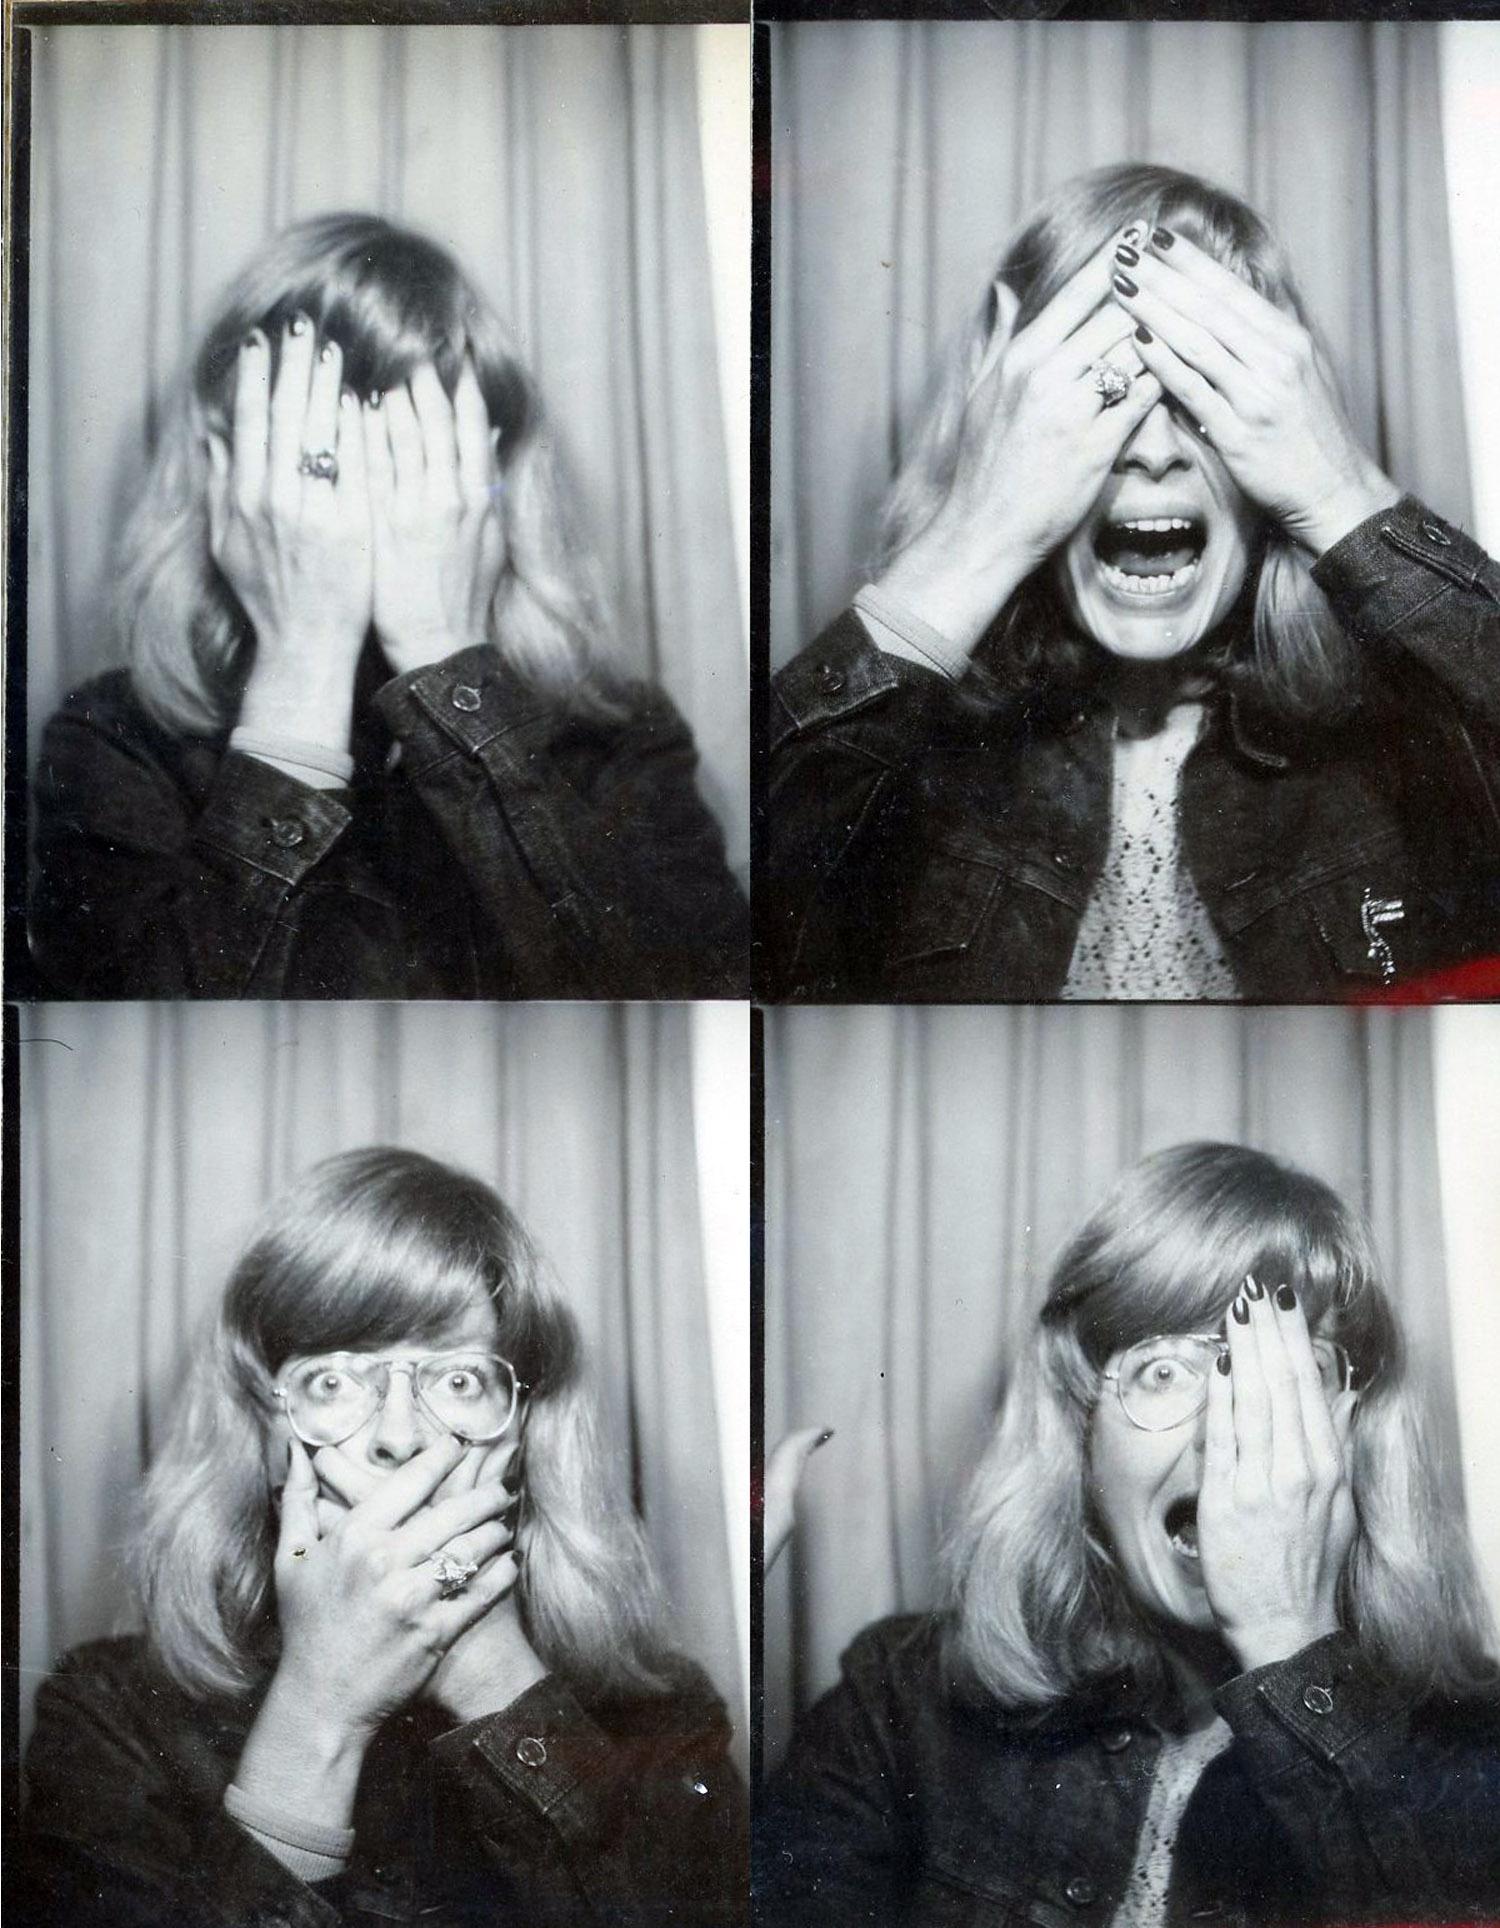 Carla Dee Ellis in Mott Street photobooth, c. 1970.